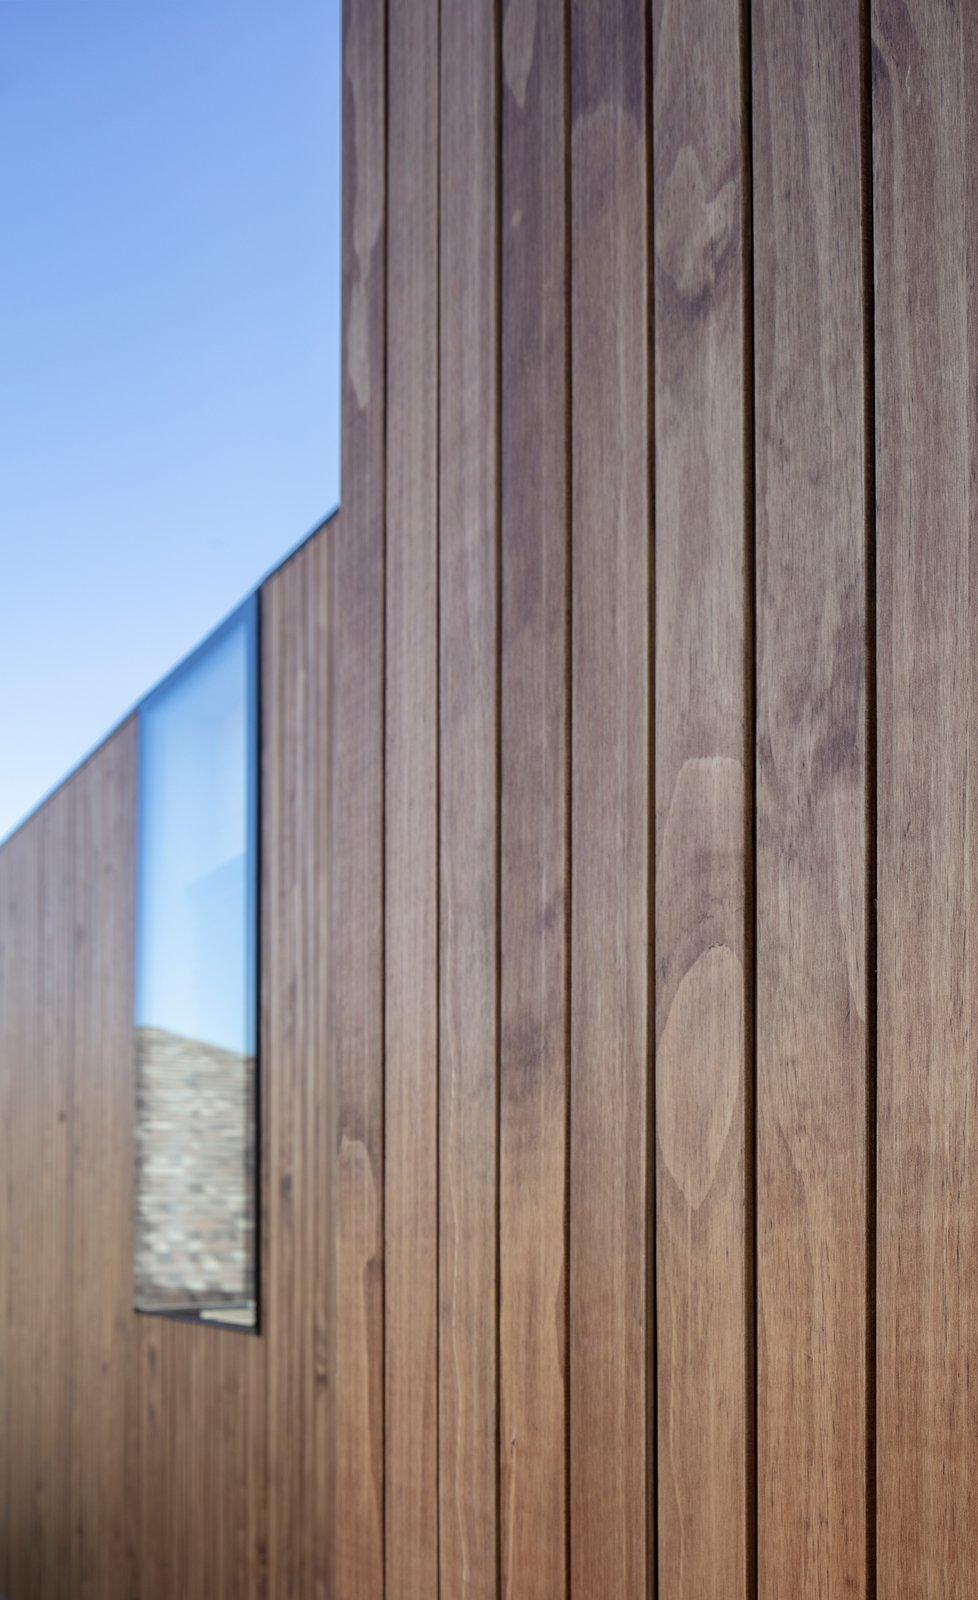 Exterior, Metal Roof Material, Concrete Siding Material, Flat RoofLine, Wood Siding Material, and House Building Type  Virginia House